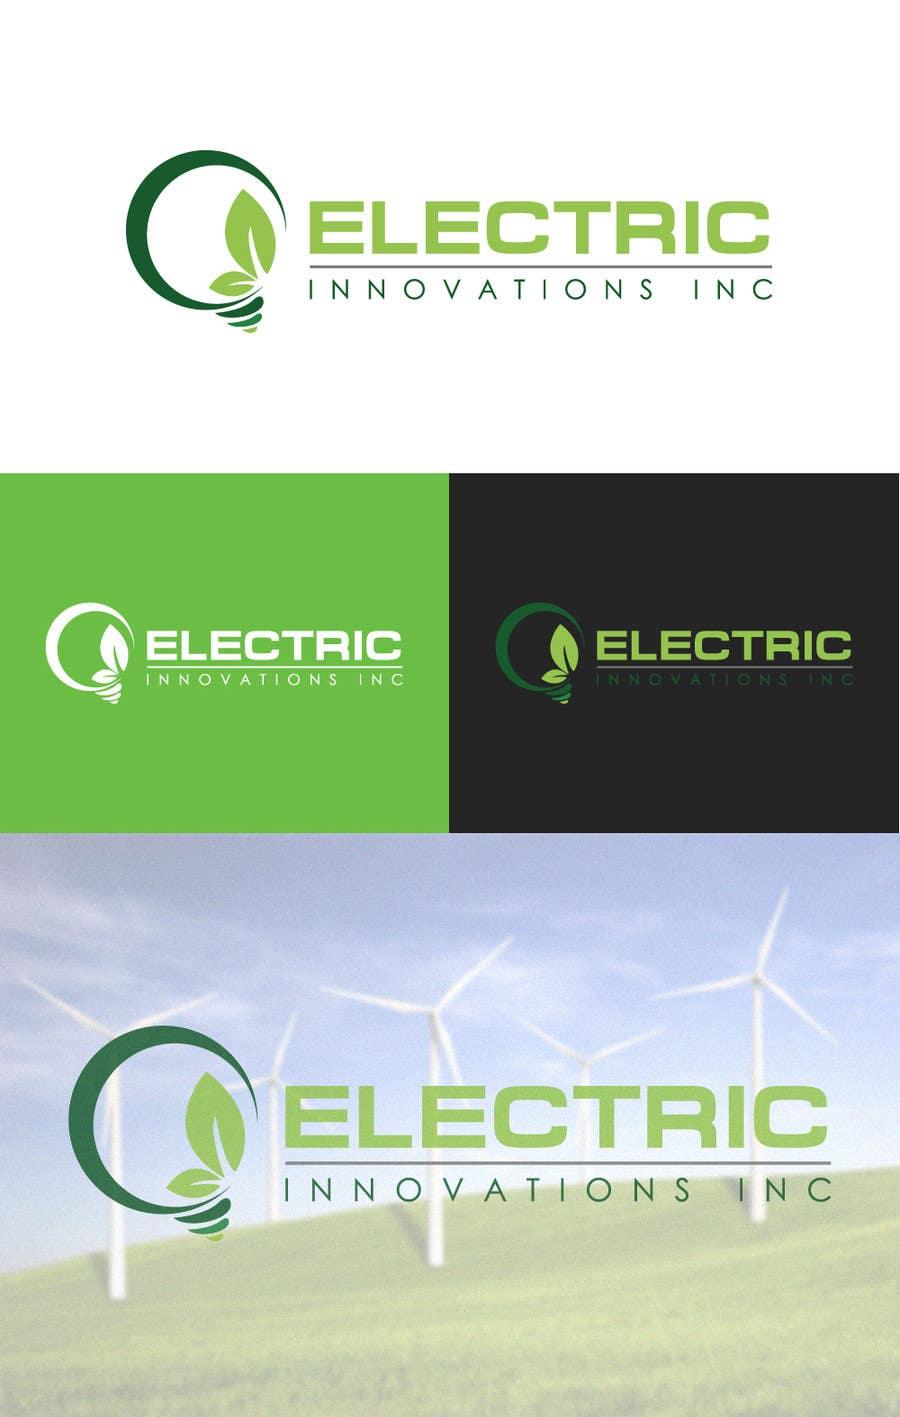 Konkurrenceindlæg #220 for Design a Logo for Electric Innovations Inc.